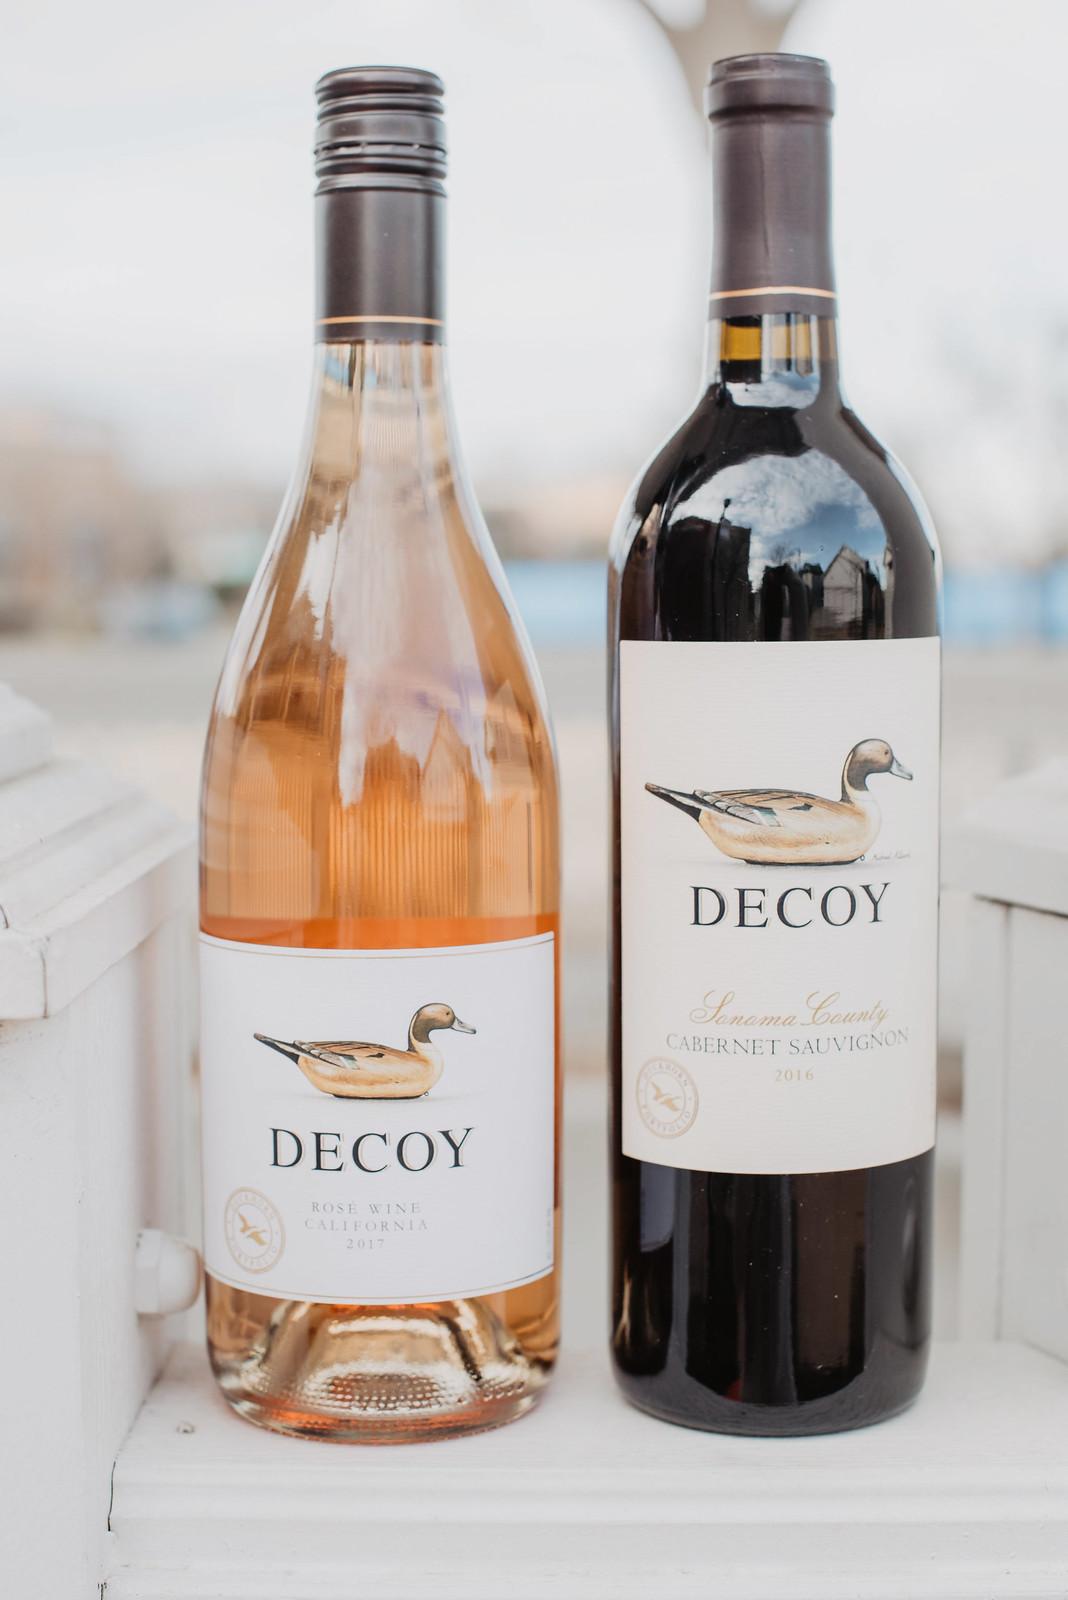 decoy rose wine